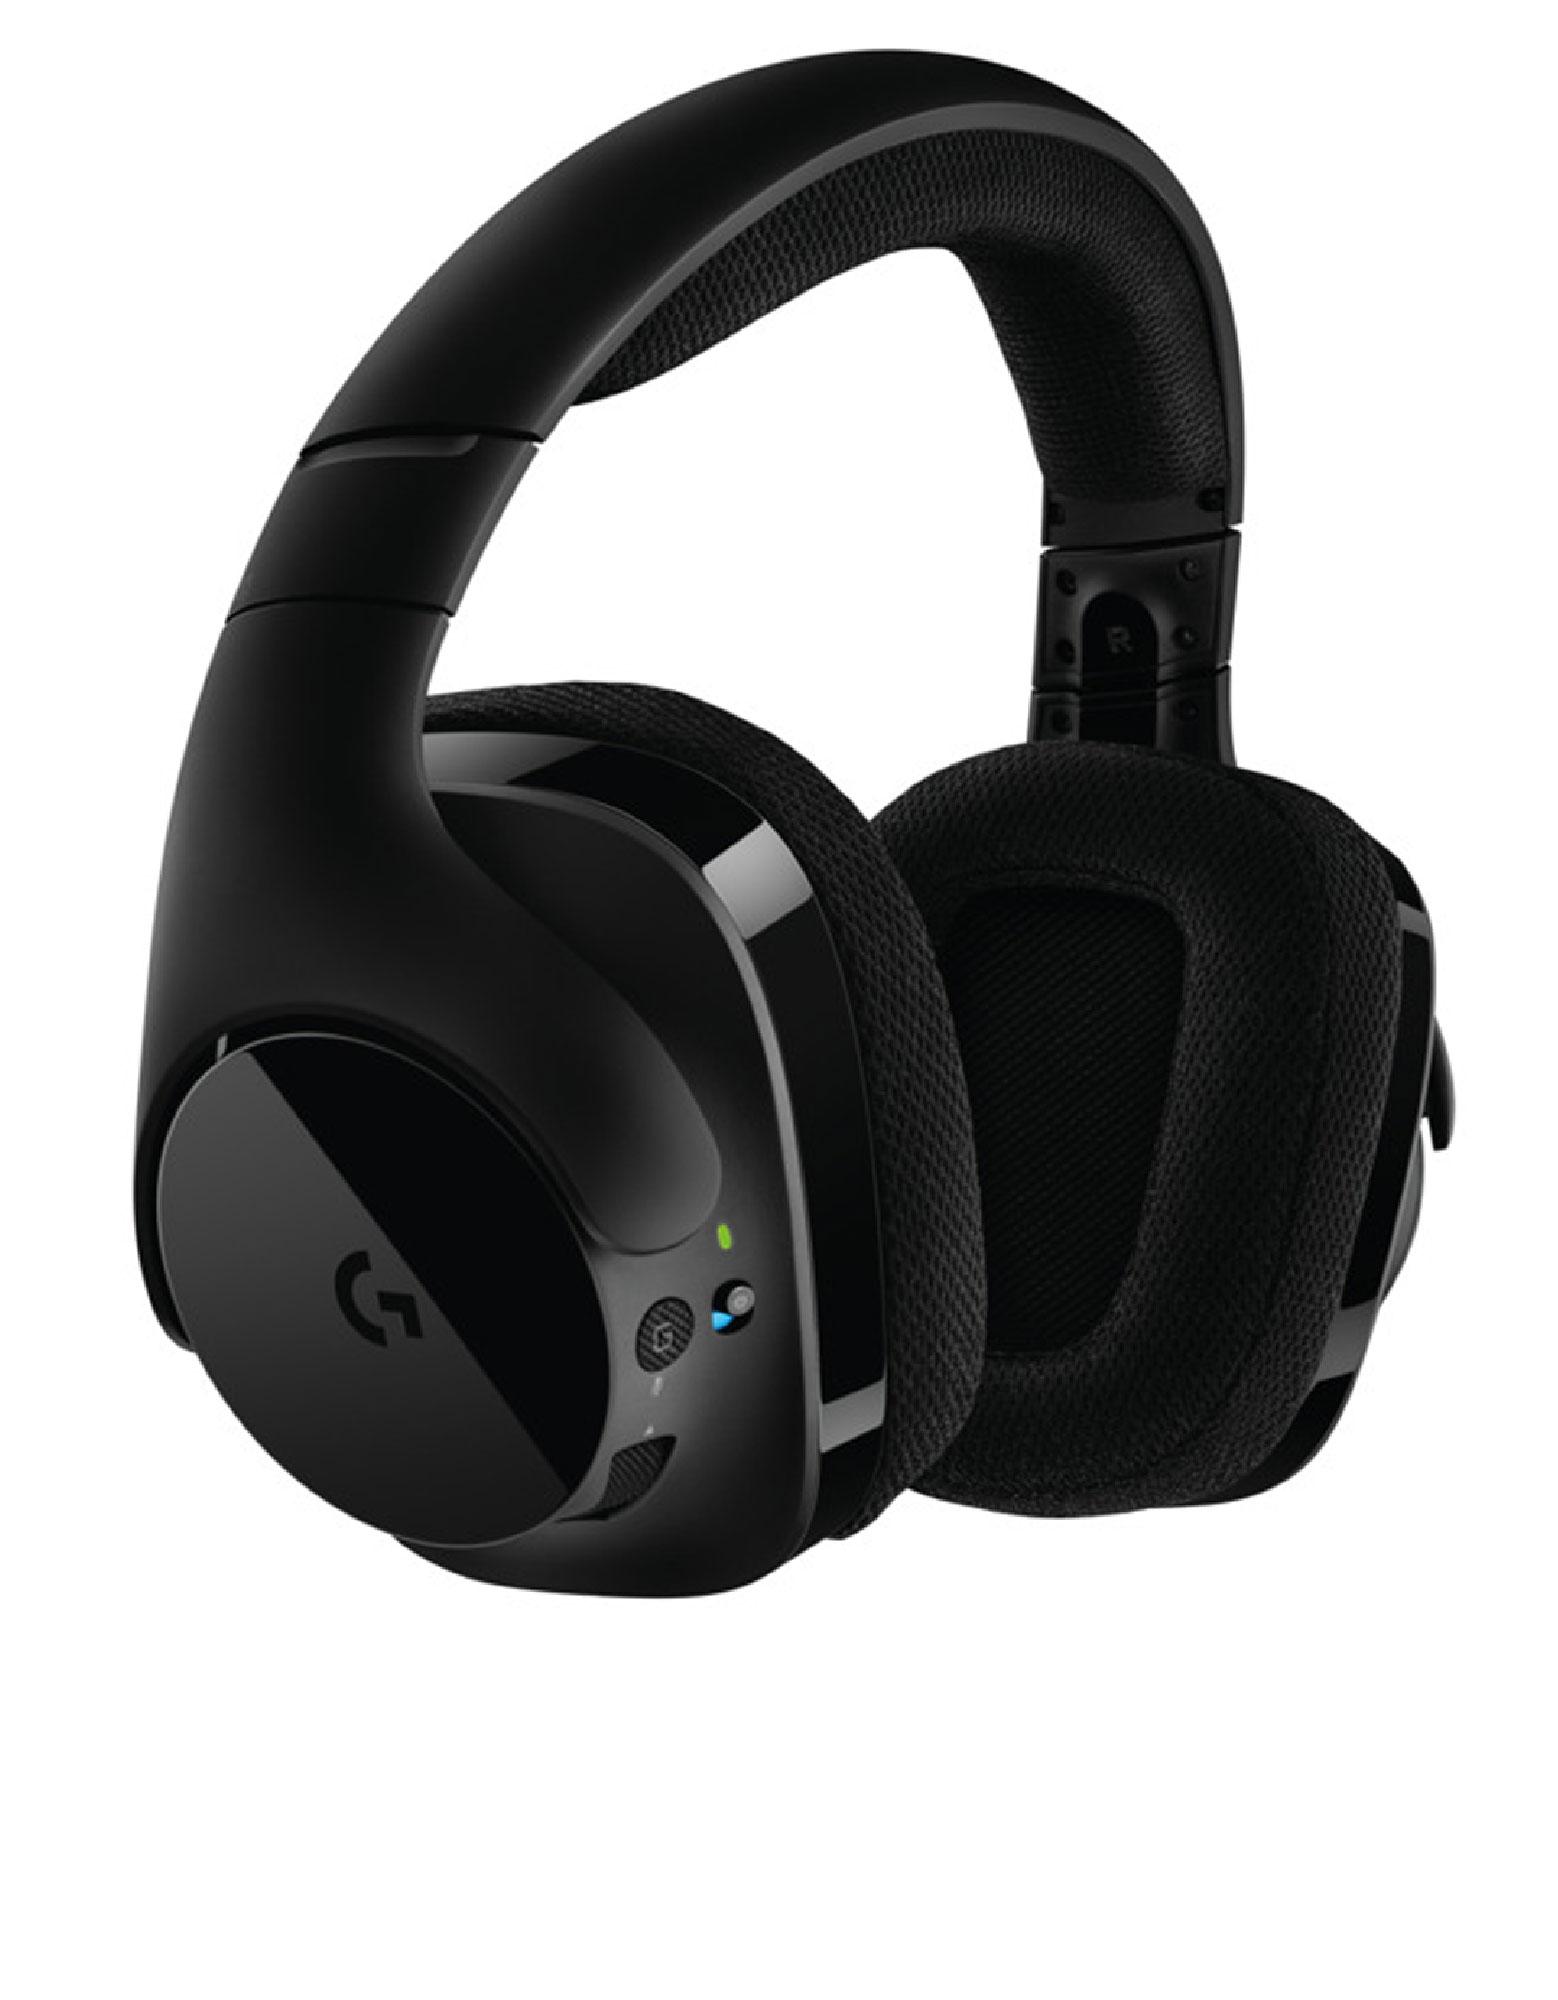 Logitech G 533 Wireless DTS 7.1 Surround Gaming Headset